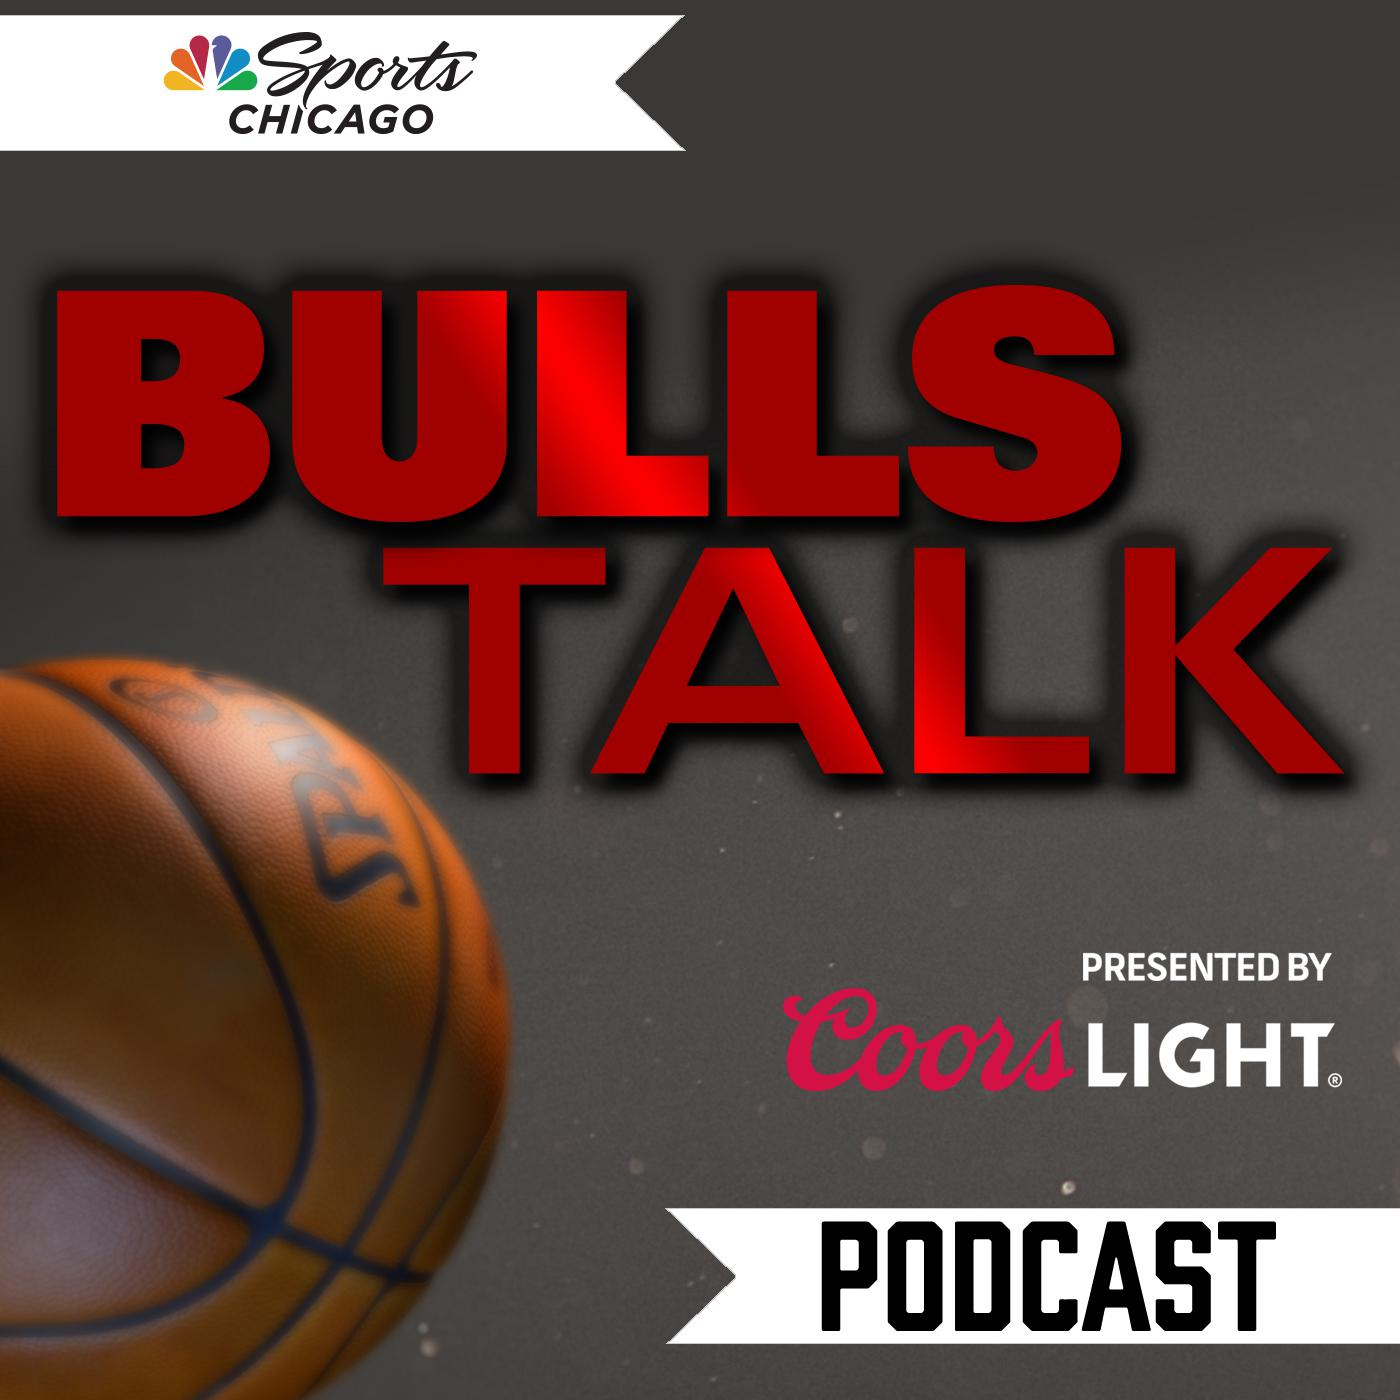 Bulls Talk Podcast - NBC Sports Chicago | Listen Notes